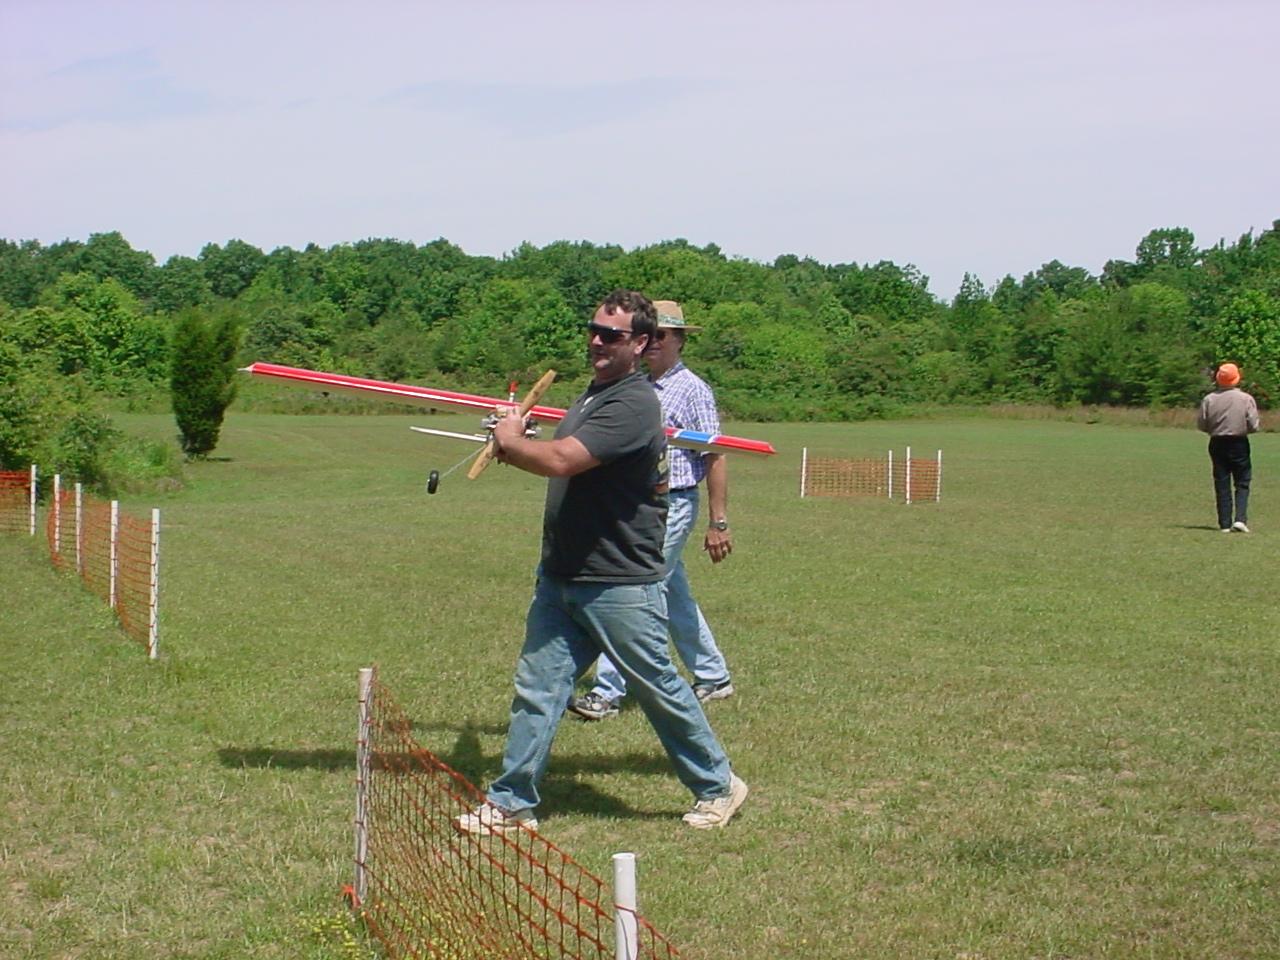 gliders-06-04-06-19